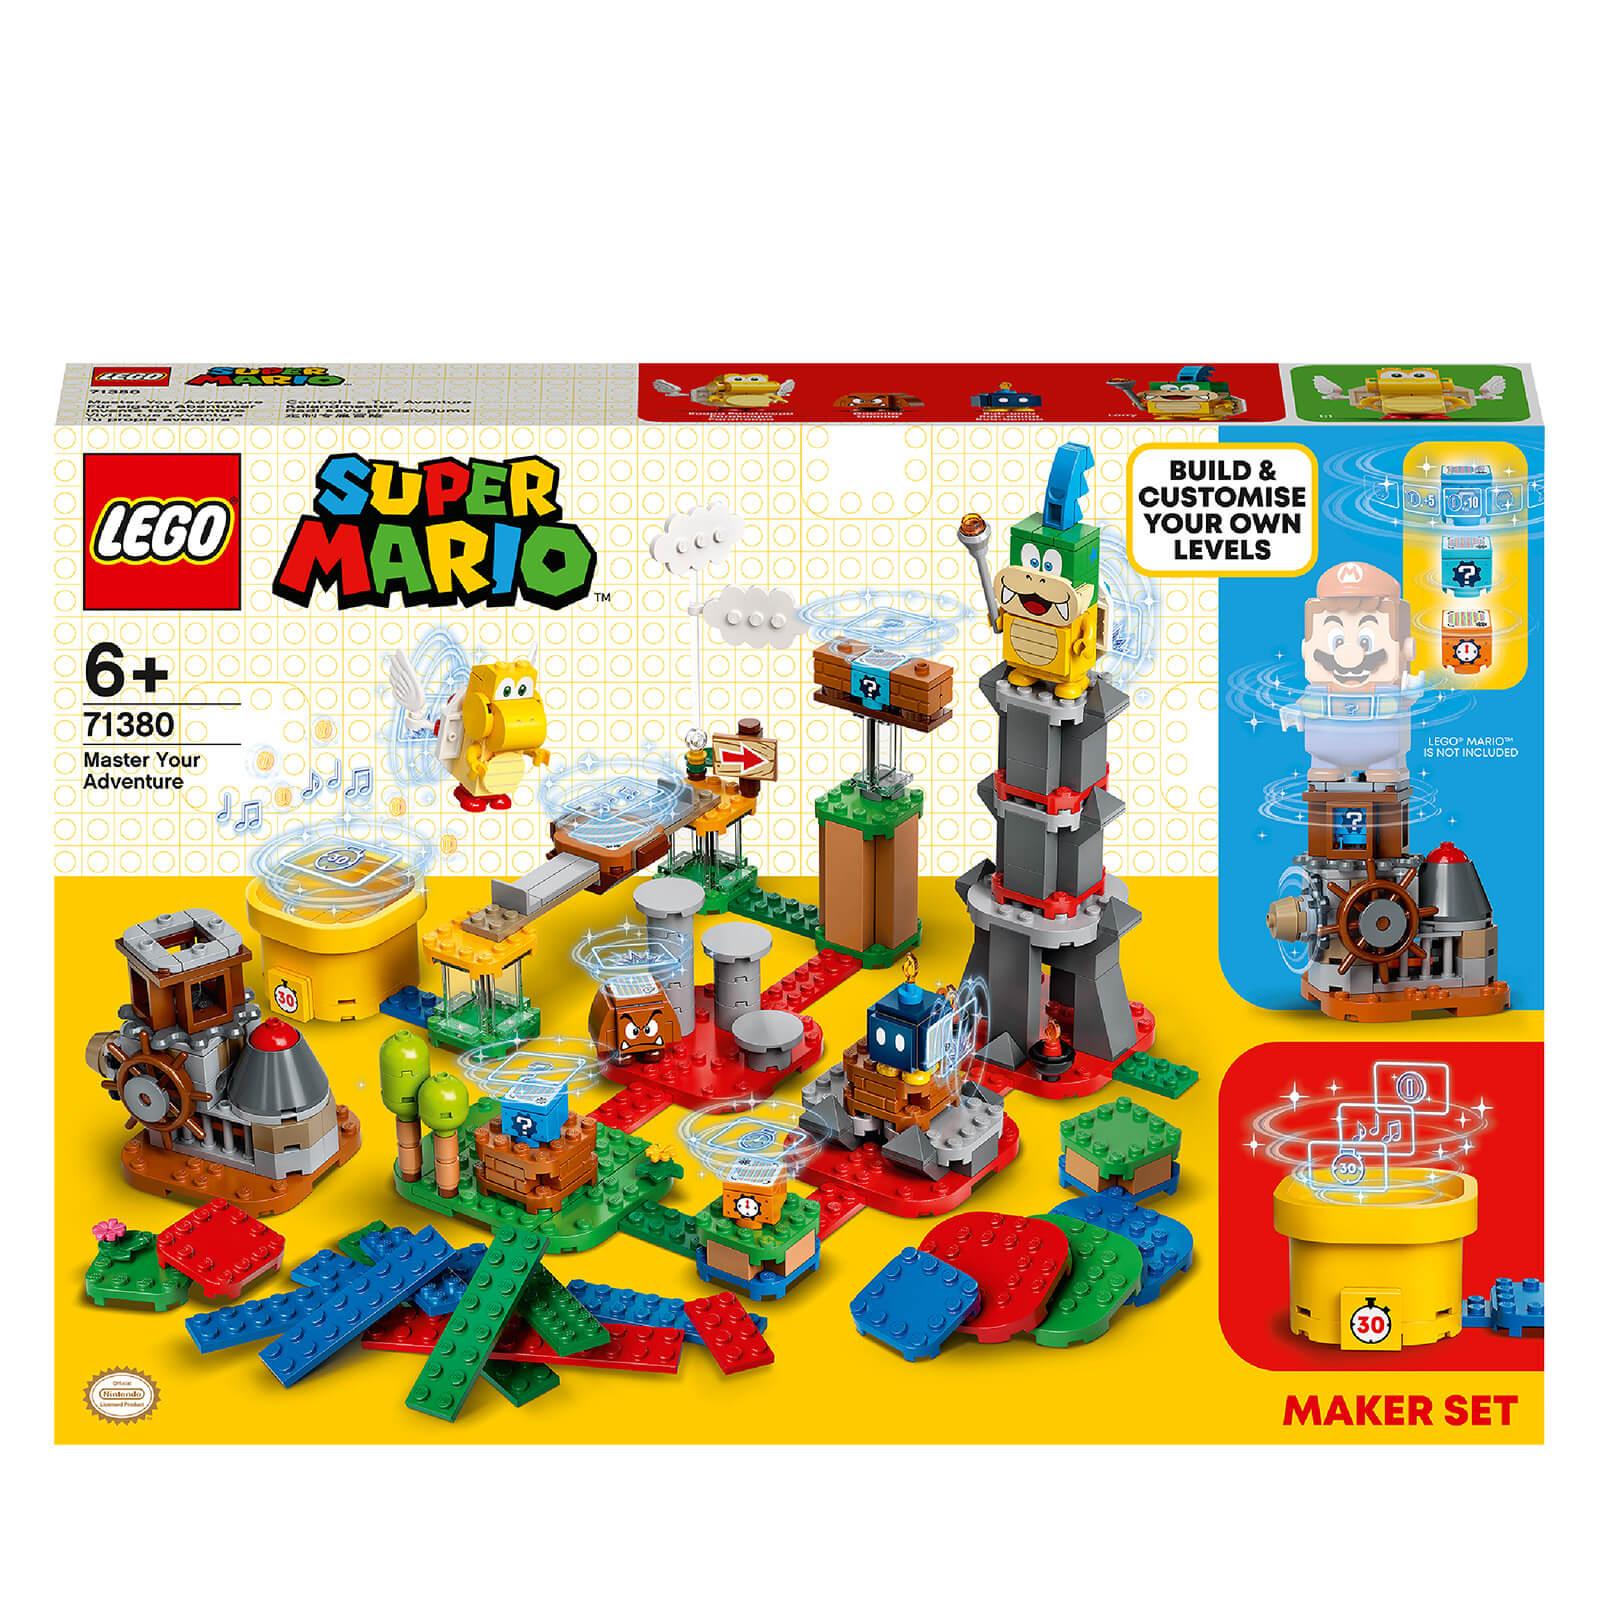 Image of LEGO Super Mario Master Your Adventure Maker Set (71380)